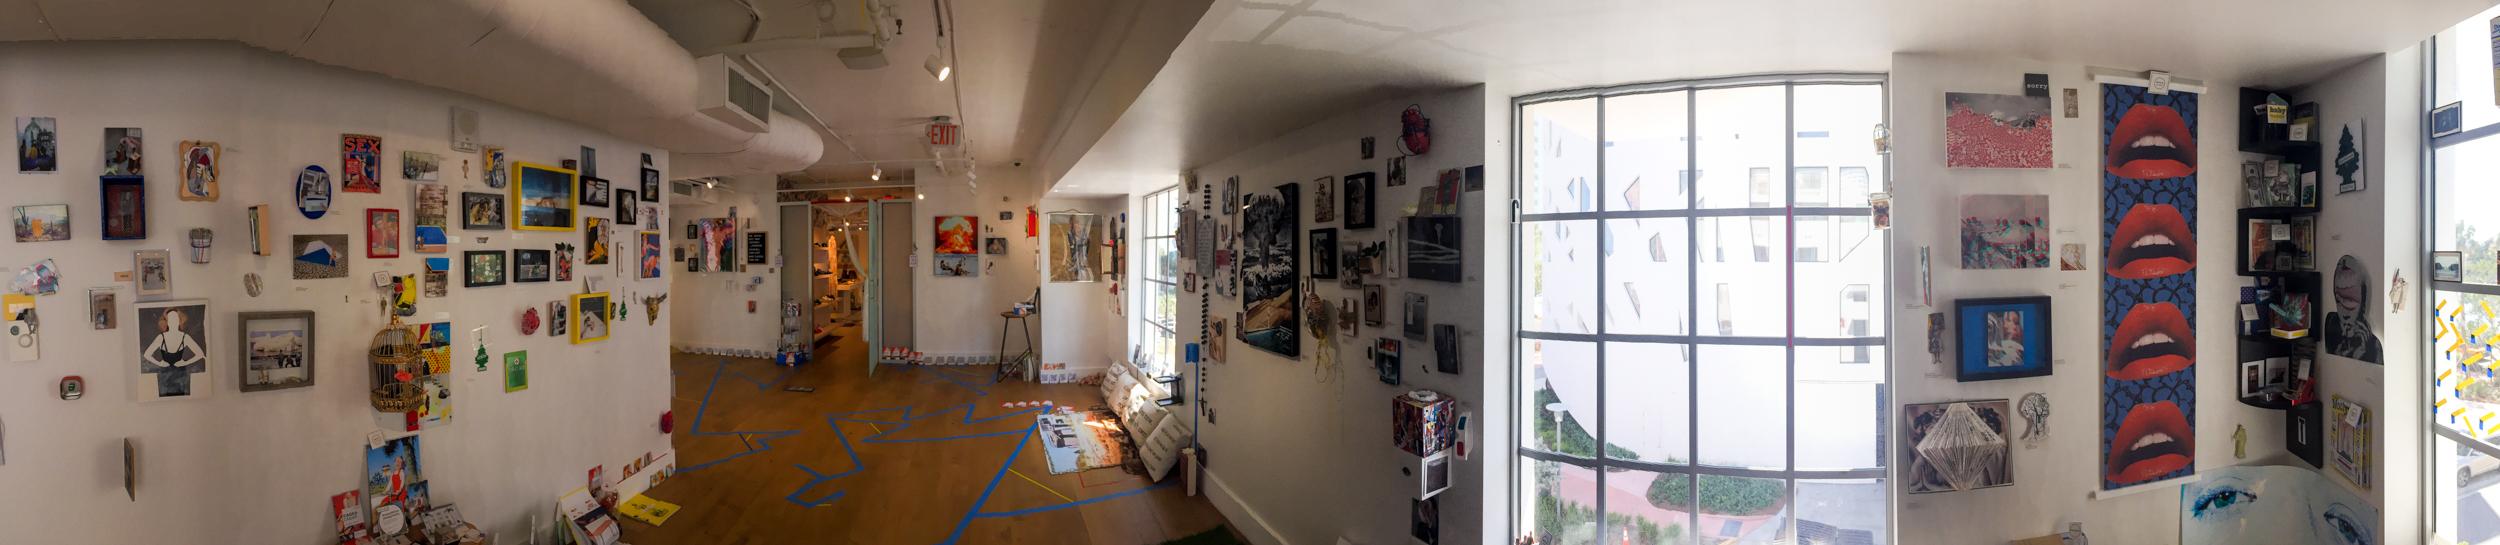 Faena-Exhibition-Images-146.jpg